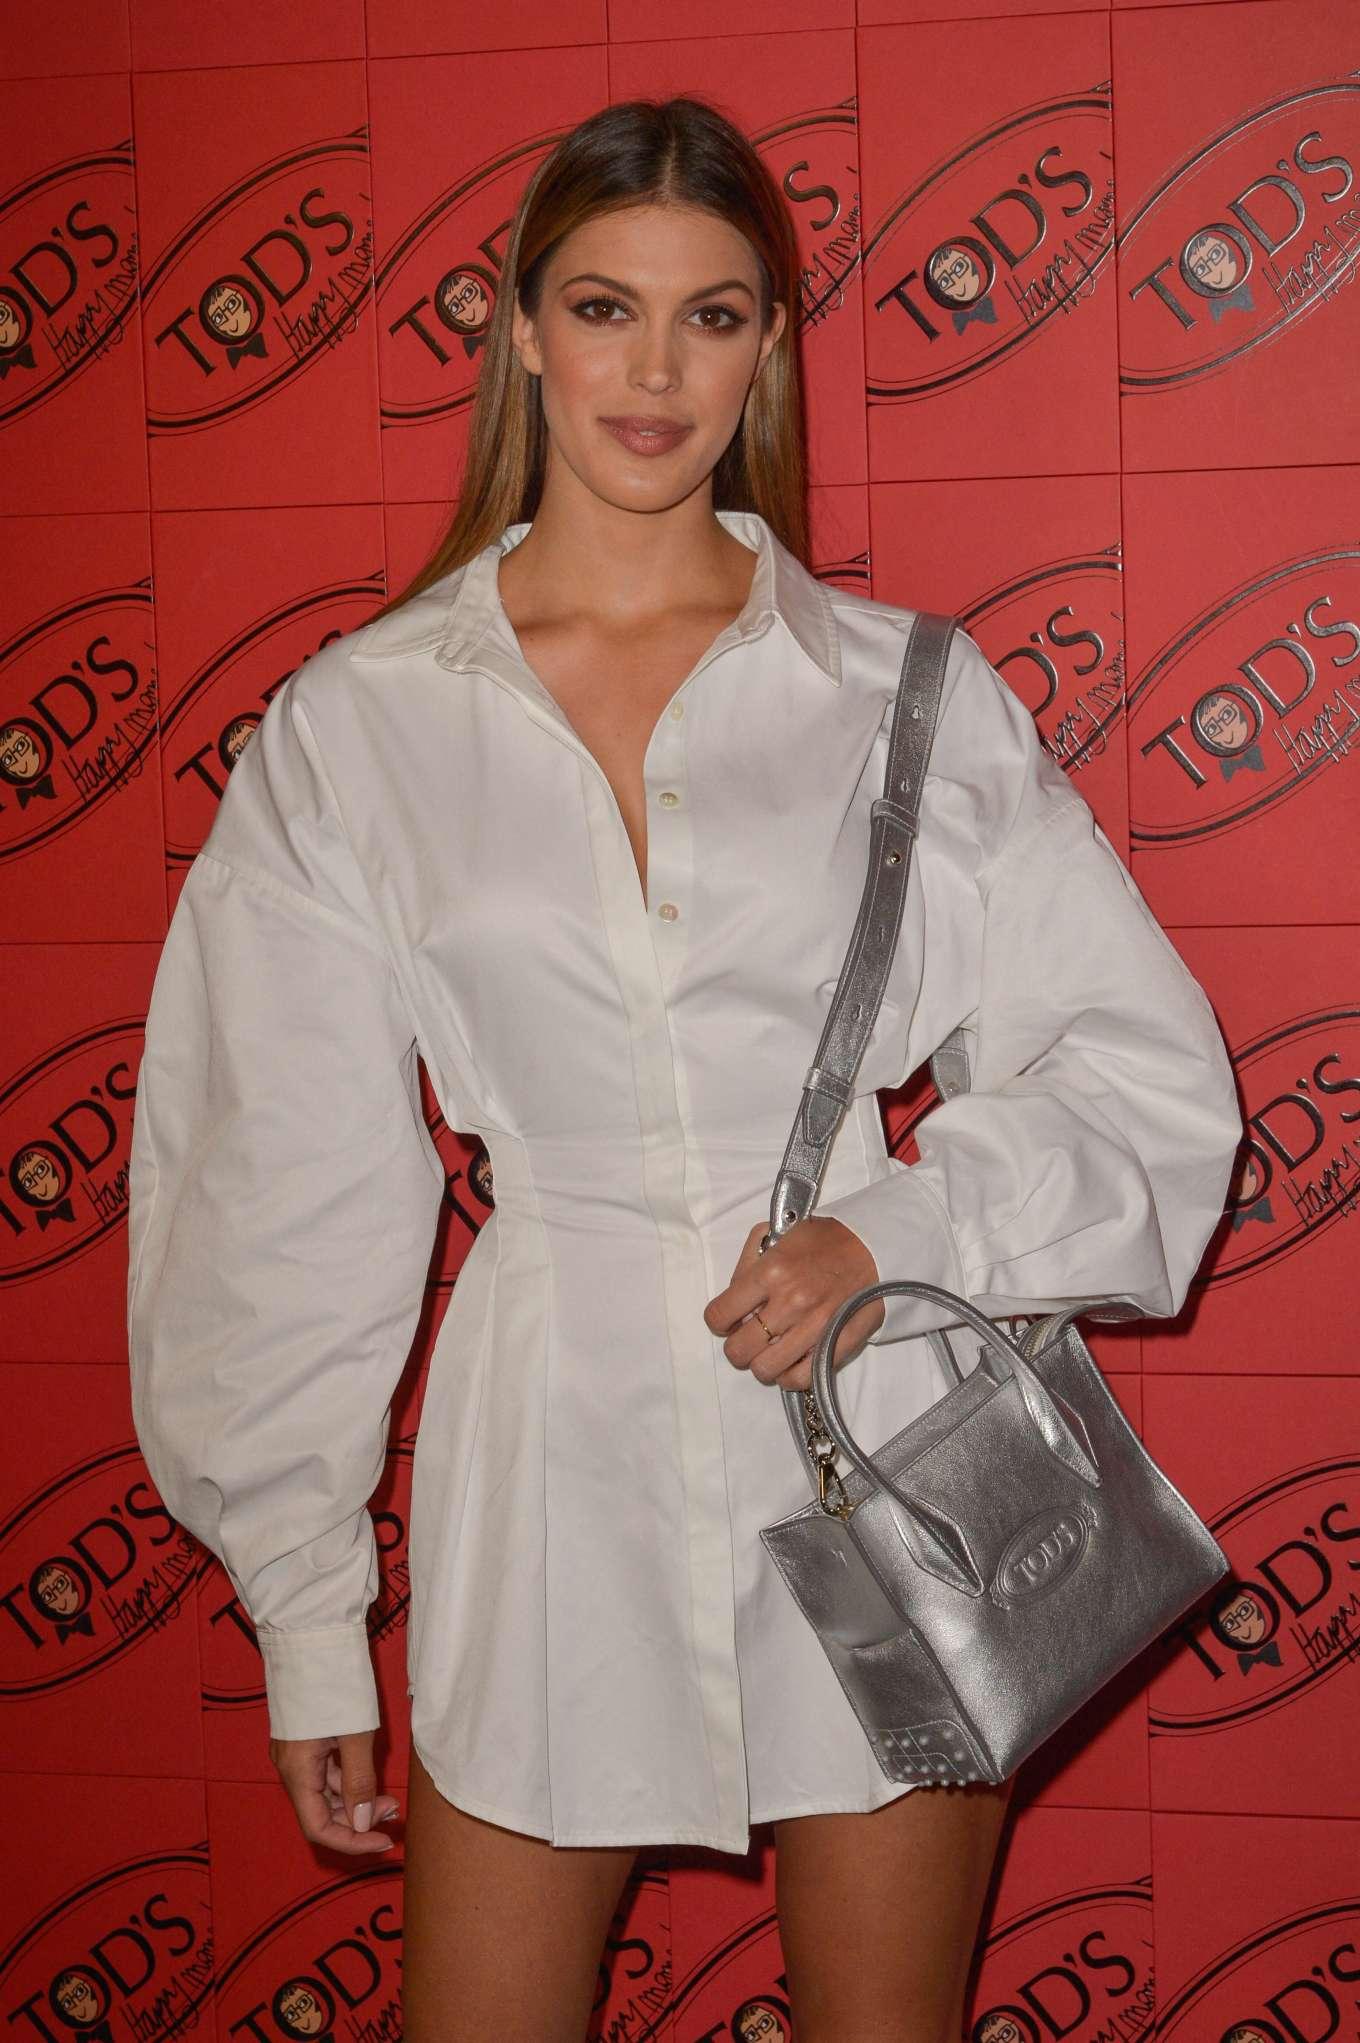 Iris Mittenaere - 2019 Paris Fashion Week - Tod's x Alber Elbaz Happy Moments Party